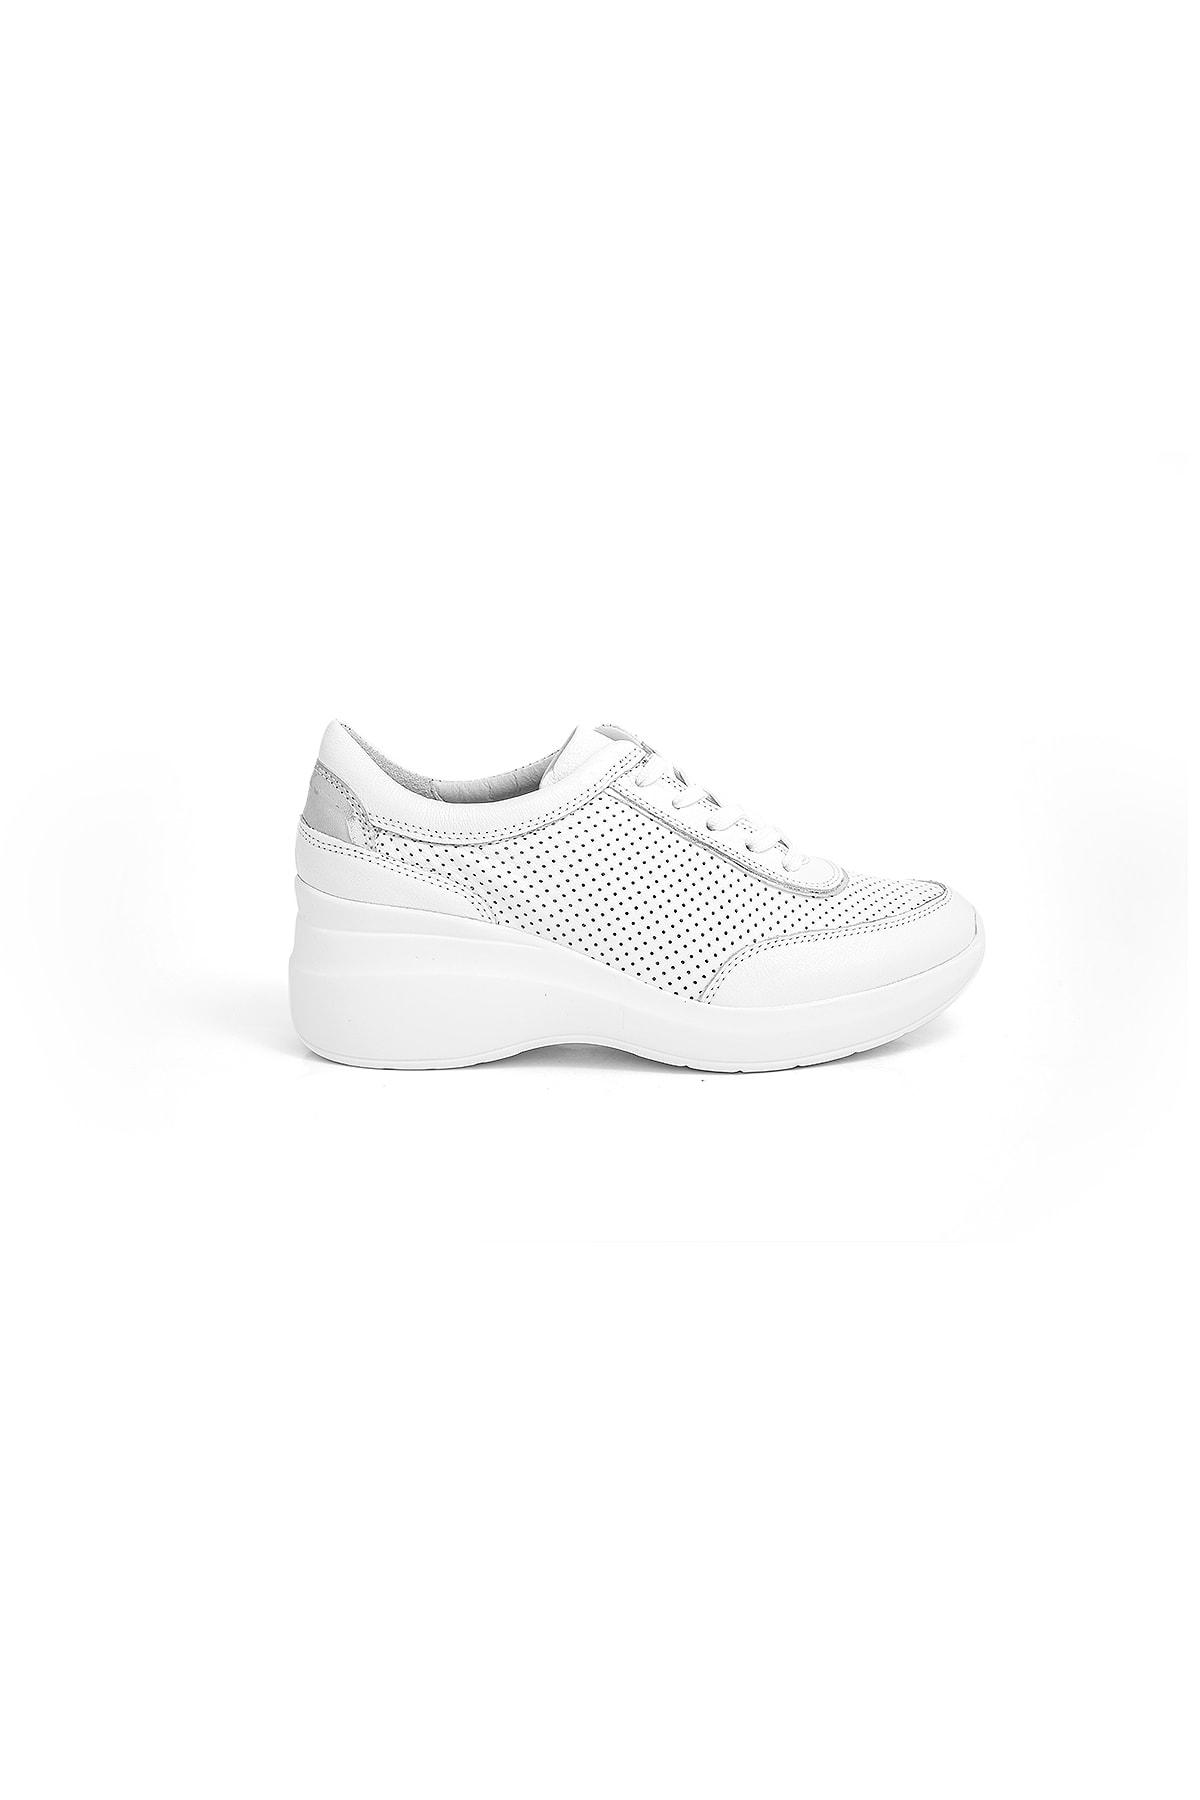 SNIPE Kadın Mallorca Sneaker